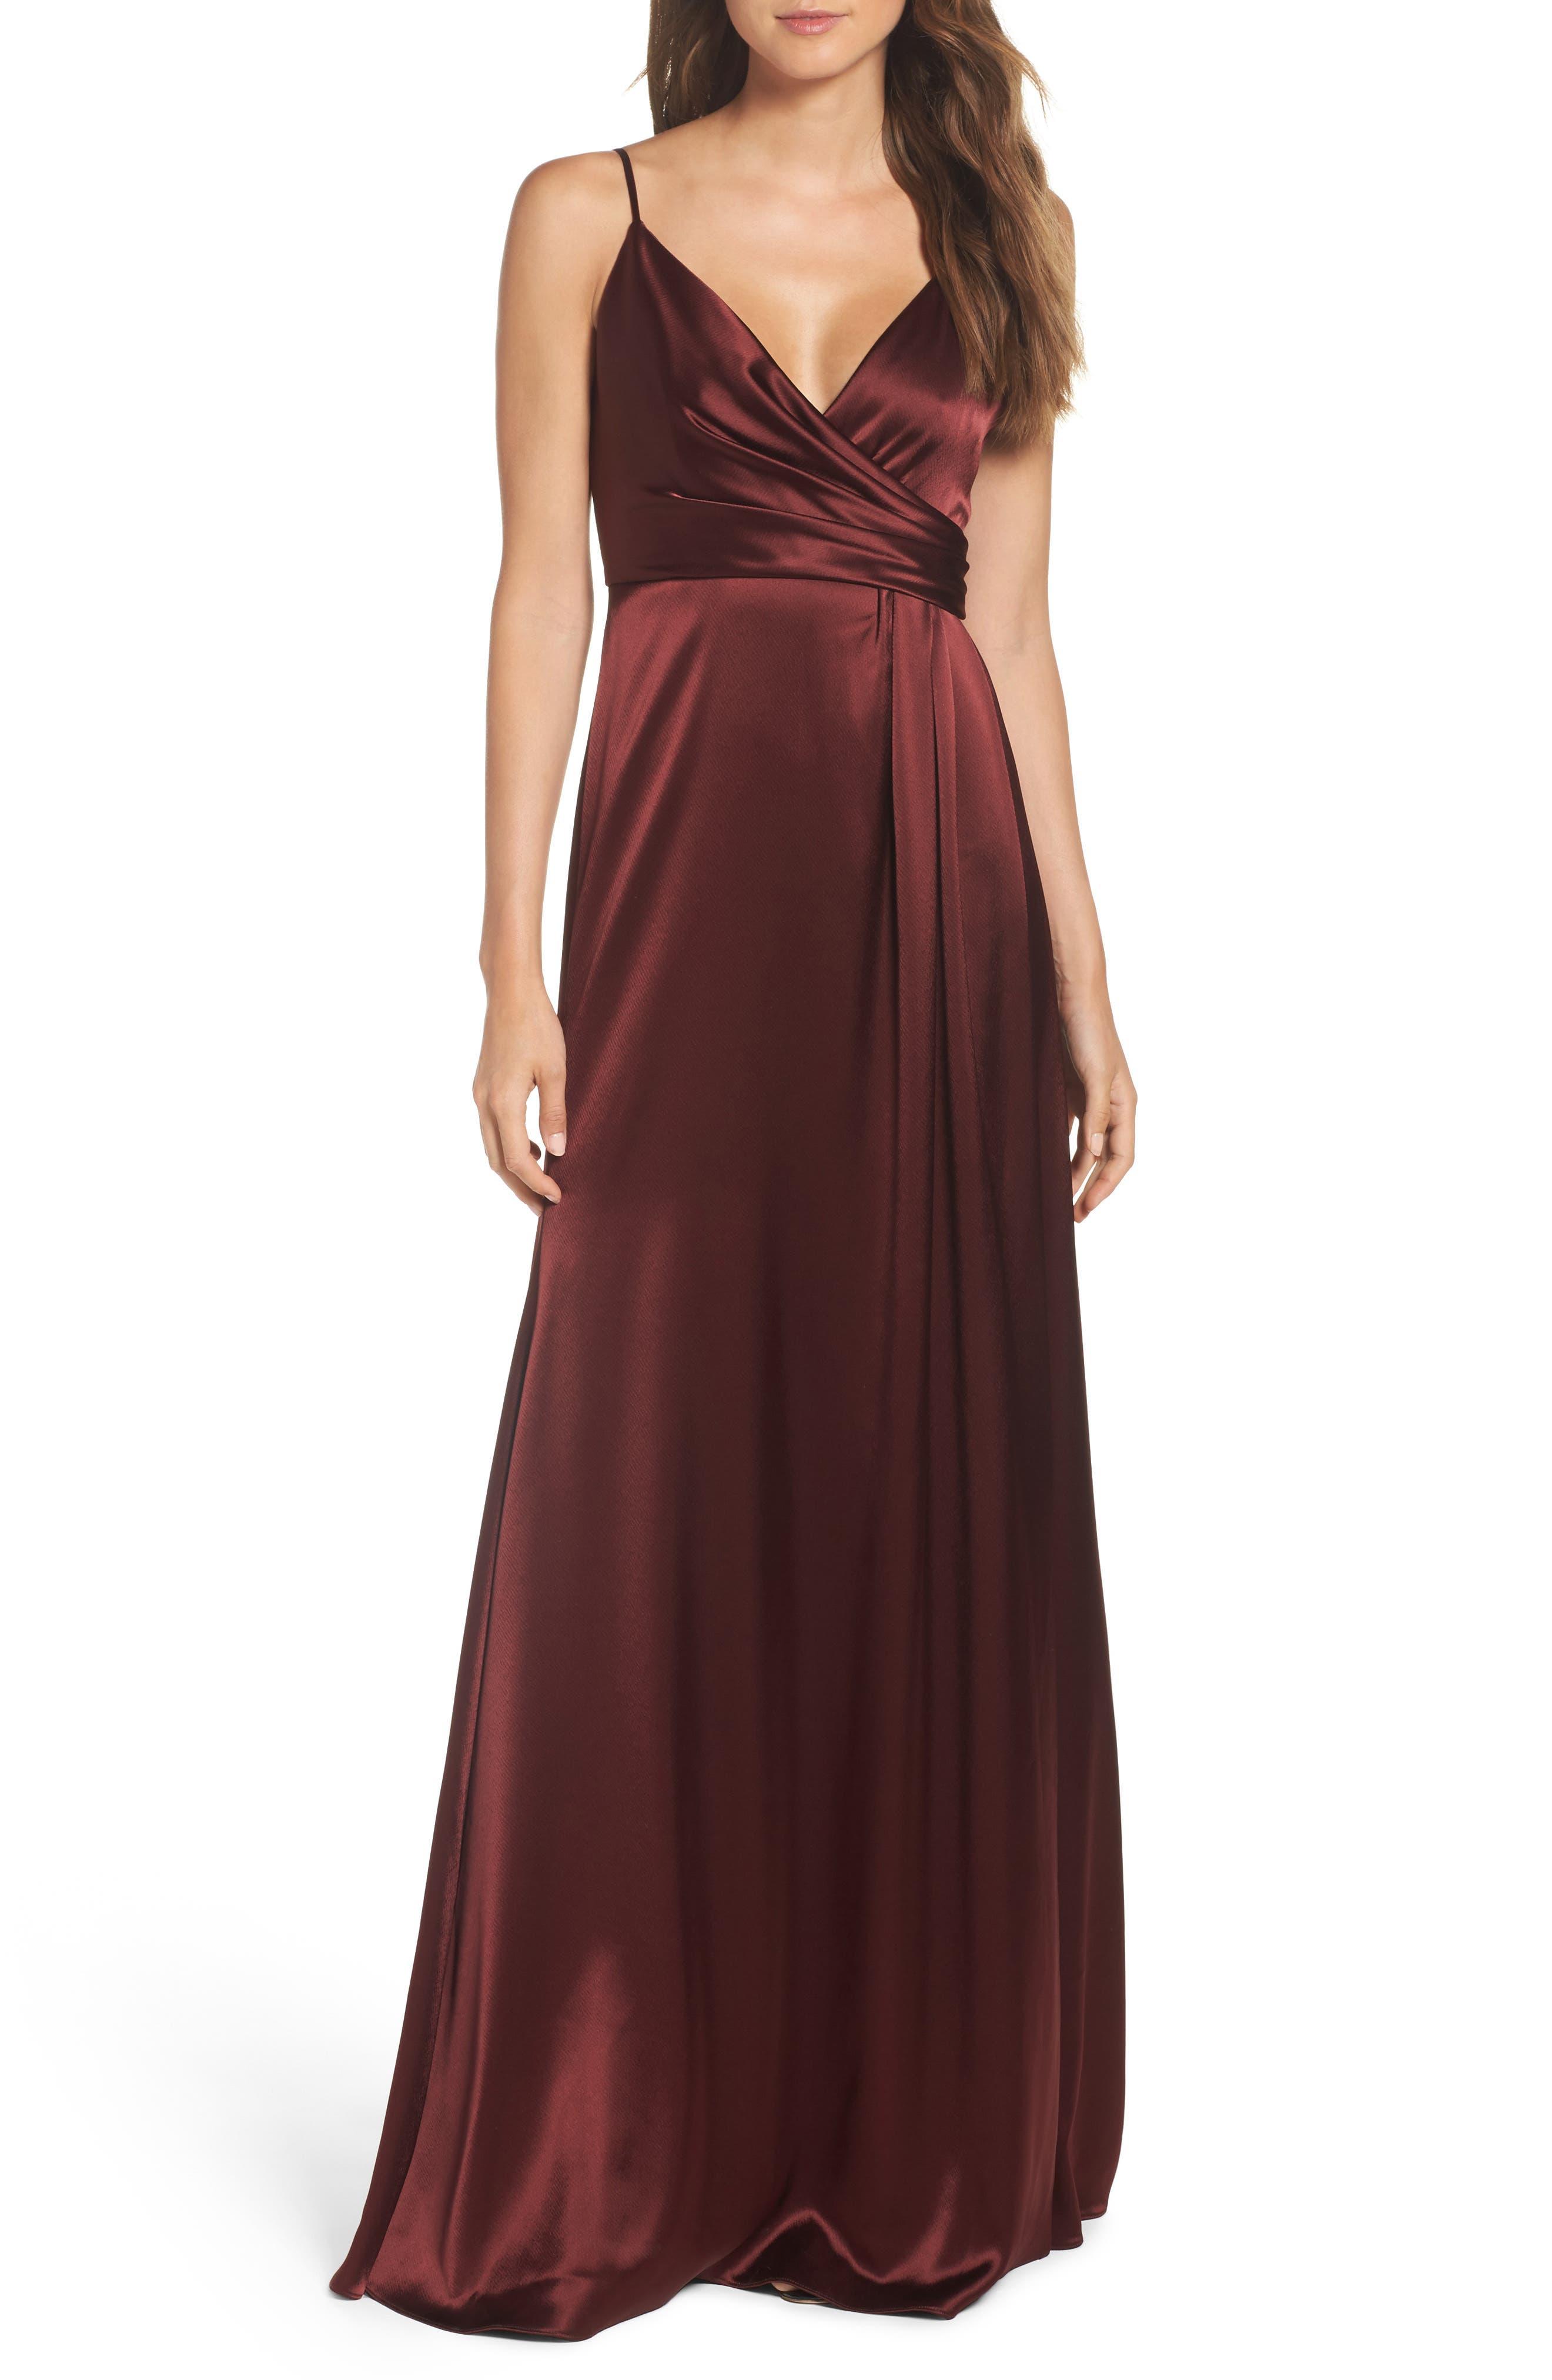 Jill Jill Stuart Faux Wrap Satin Gown